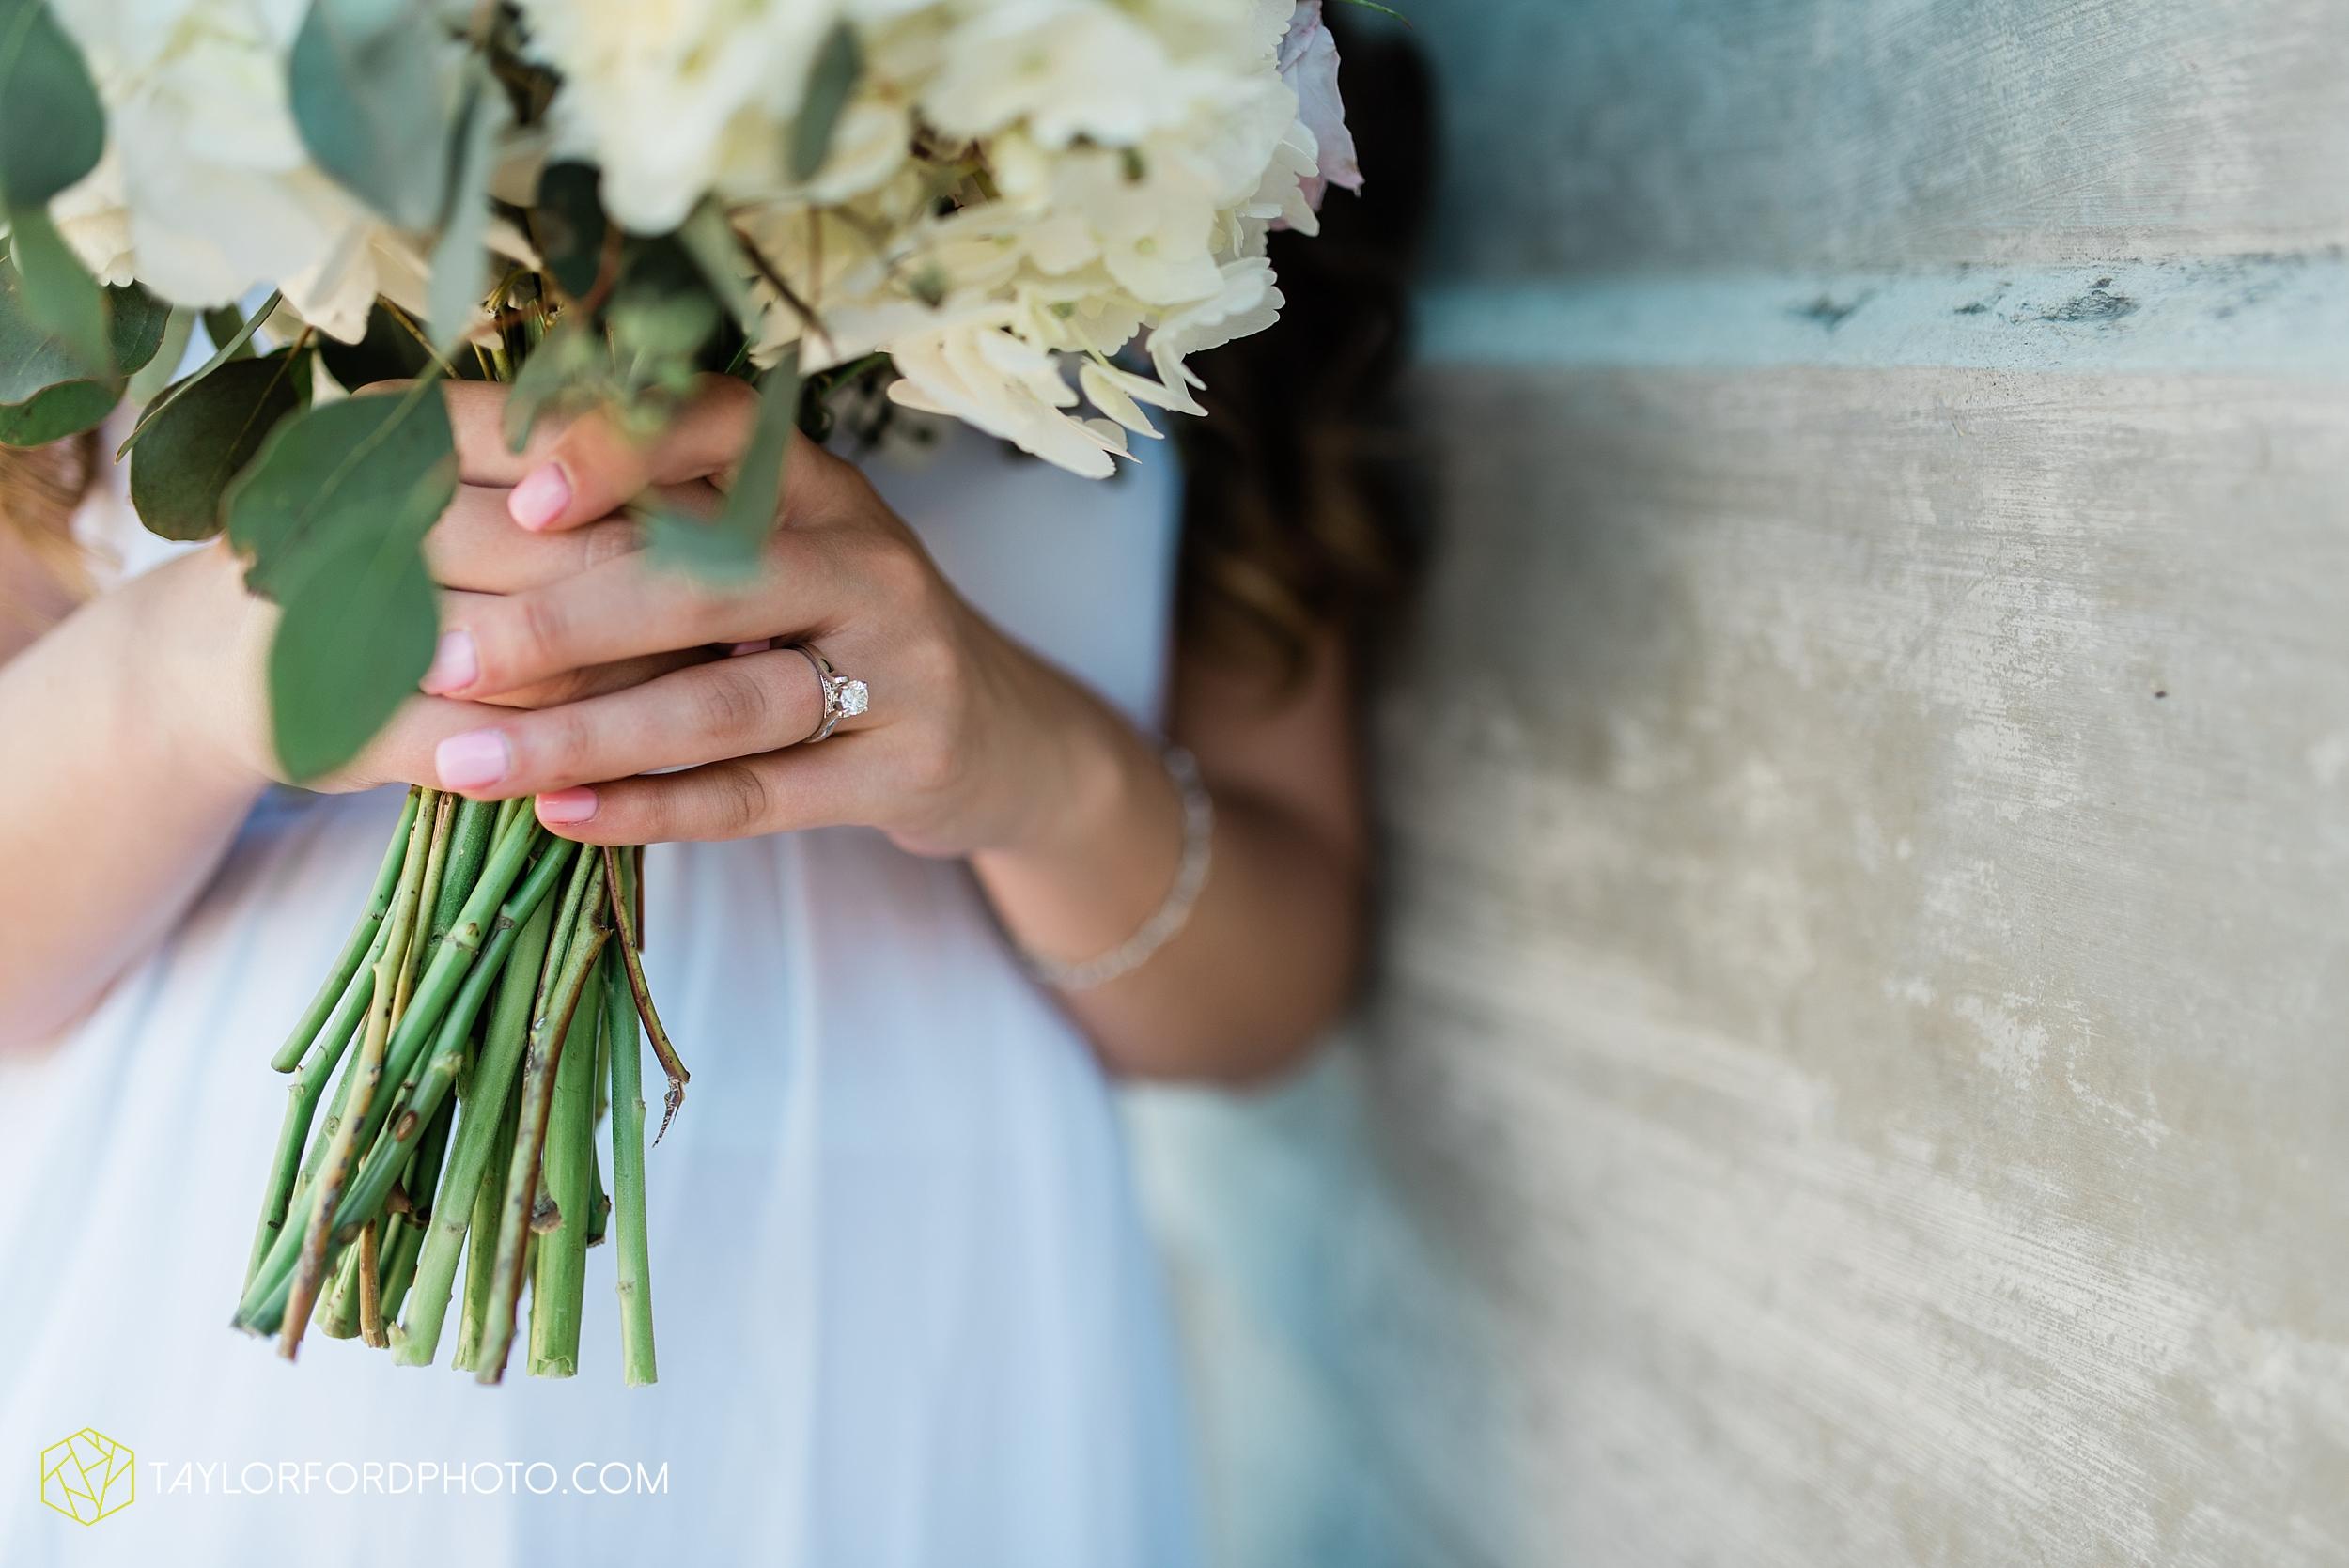 lakeside-rose-gardens-fort-wayne-indiana-elopement-wedding-photographer-Taylor-Ford-Photography_7160.jpg